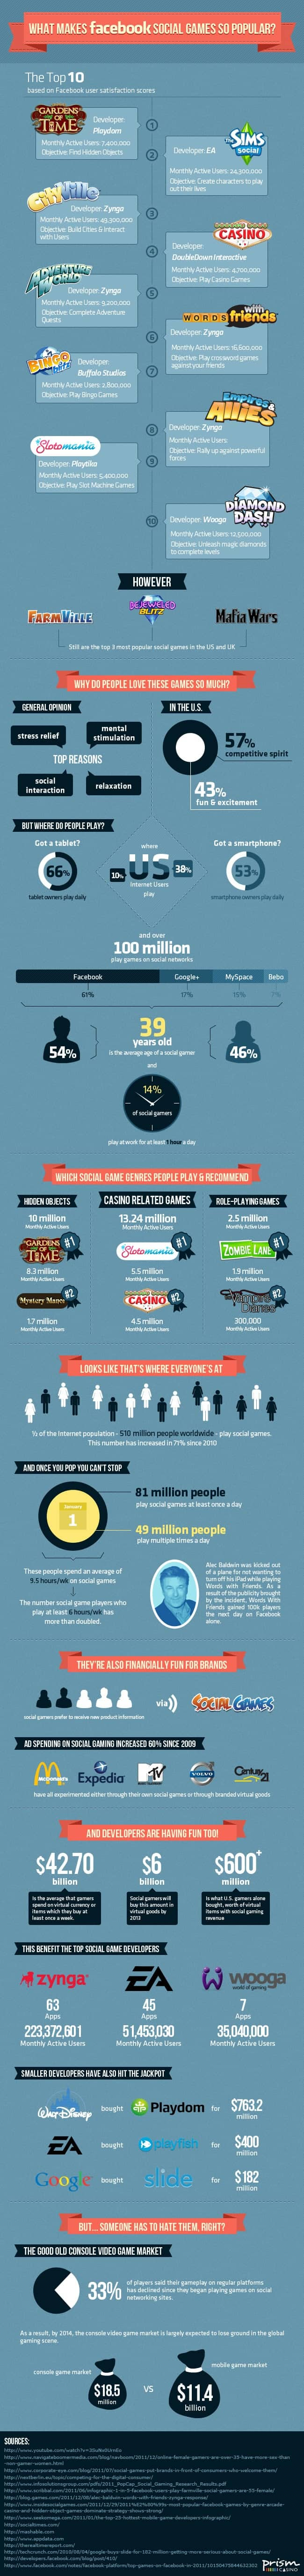 Facebook Social Games Infographic